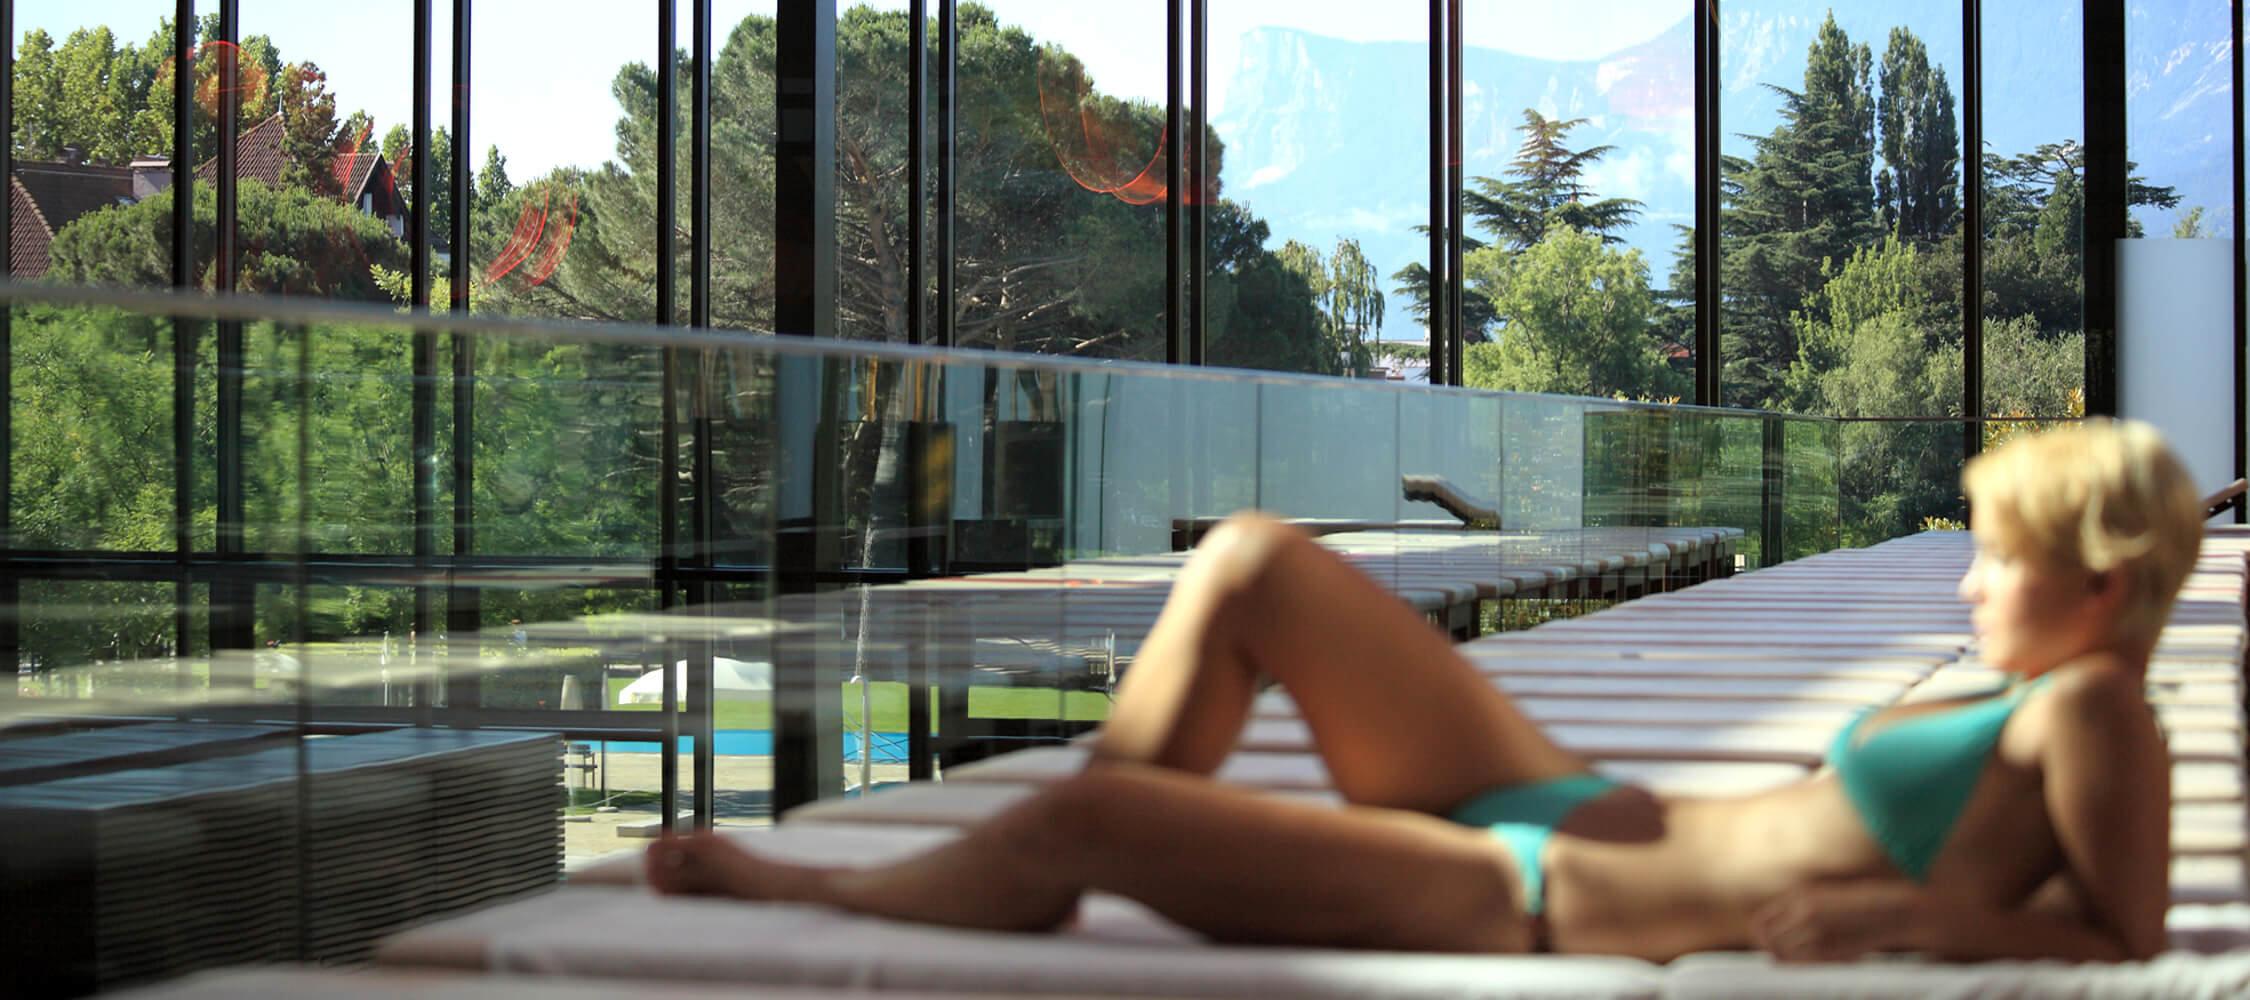 Italien-Trentino_Suedtirol_Alto_Adige_Merano_Meran_Therme_Pool_Badehalle_Schwimmbad_Panorama_Manuela_Prossliner_2250x1000